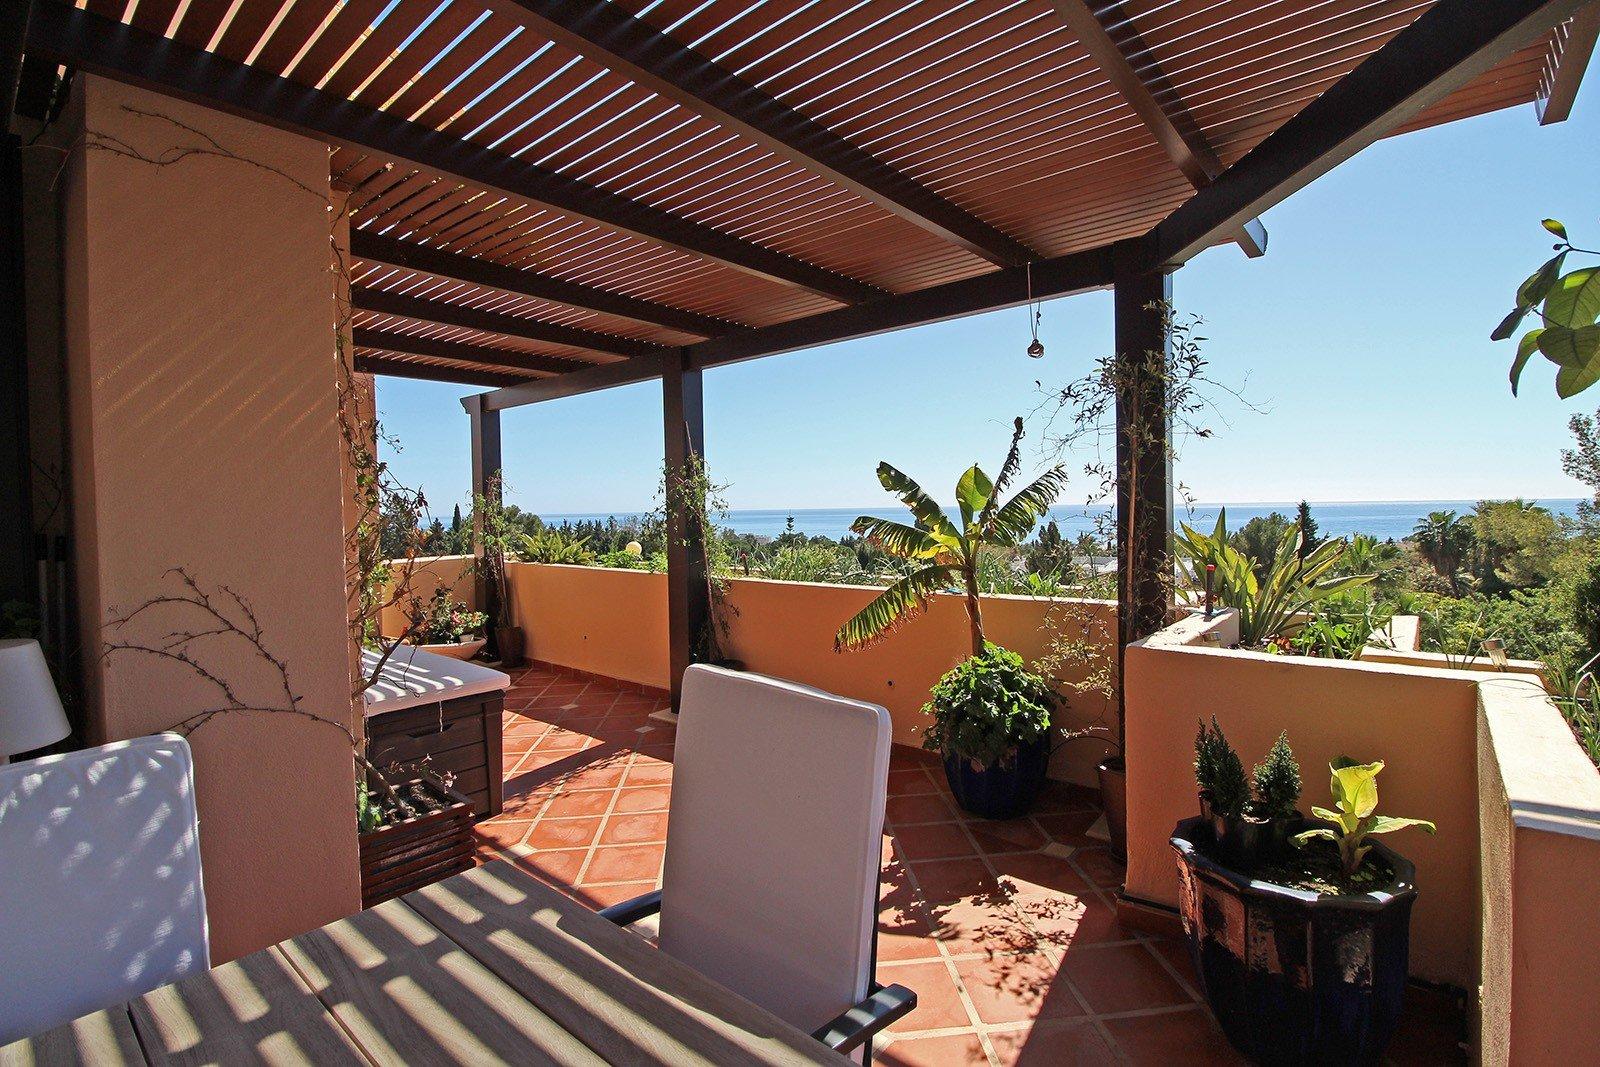 Penthouse att hyra i Marbella, El Virrey de Nagüeles